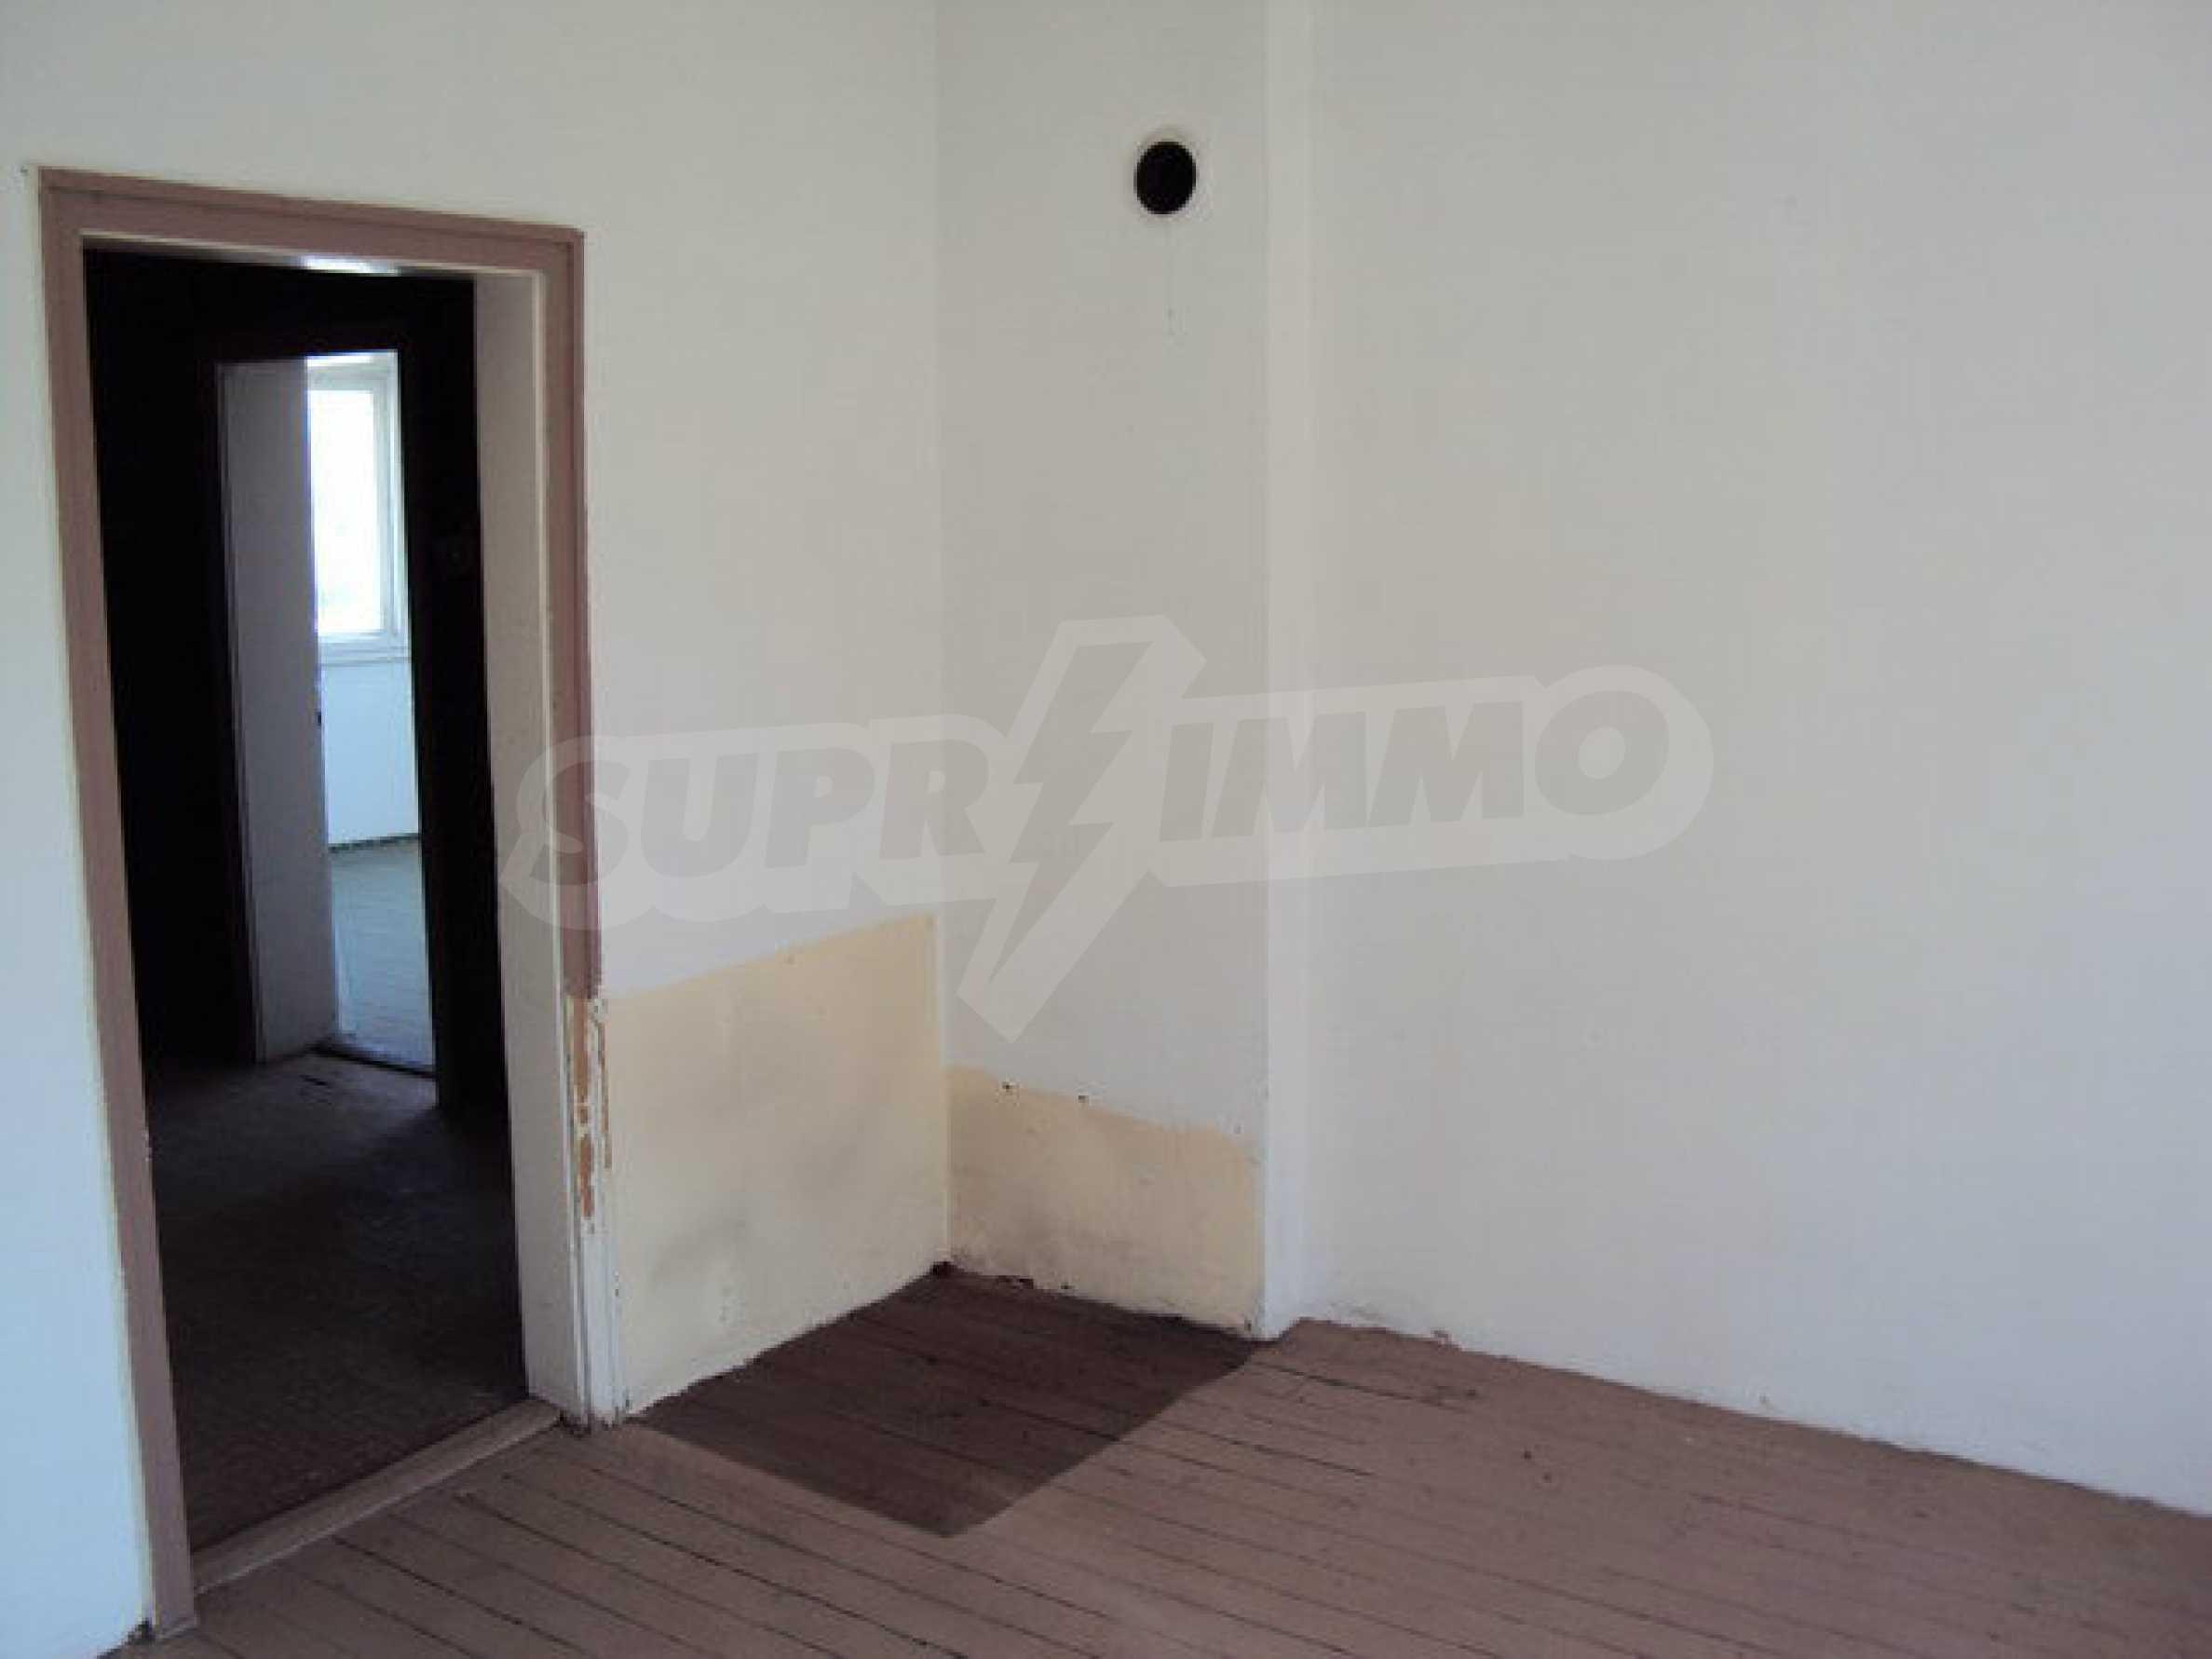 Spacious house with a yard, garage and additional building Dryanovo 13